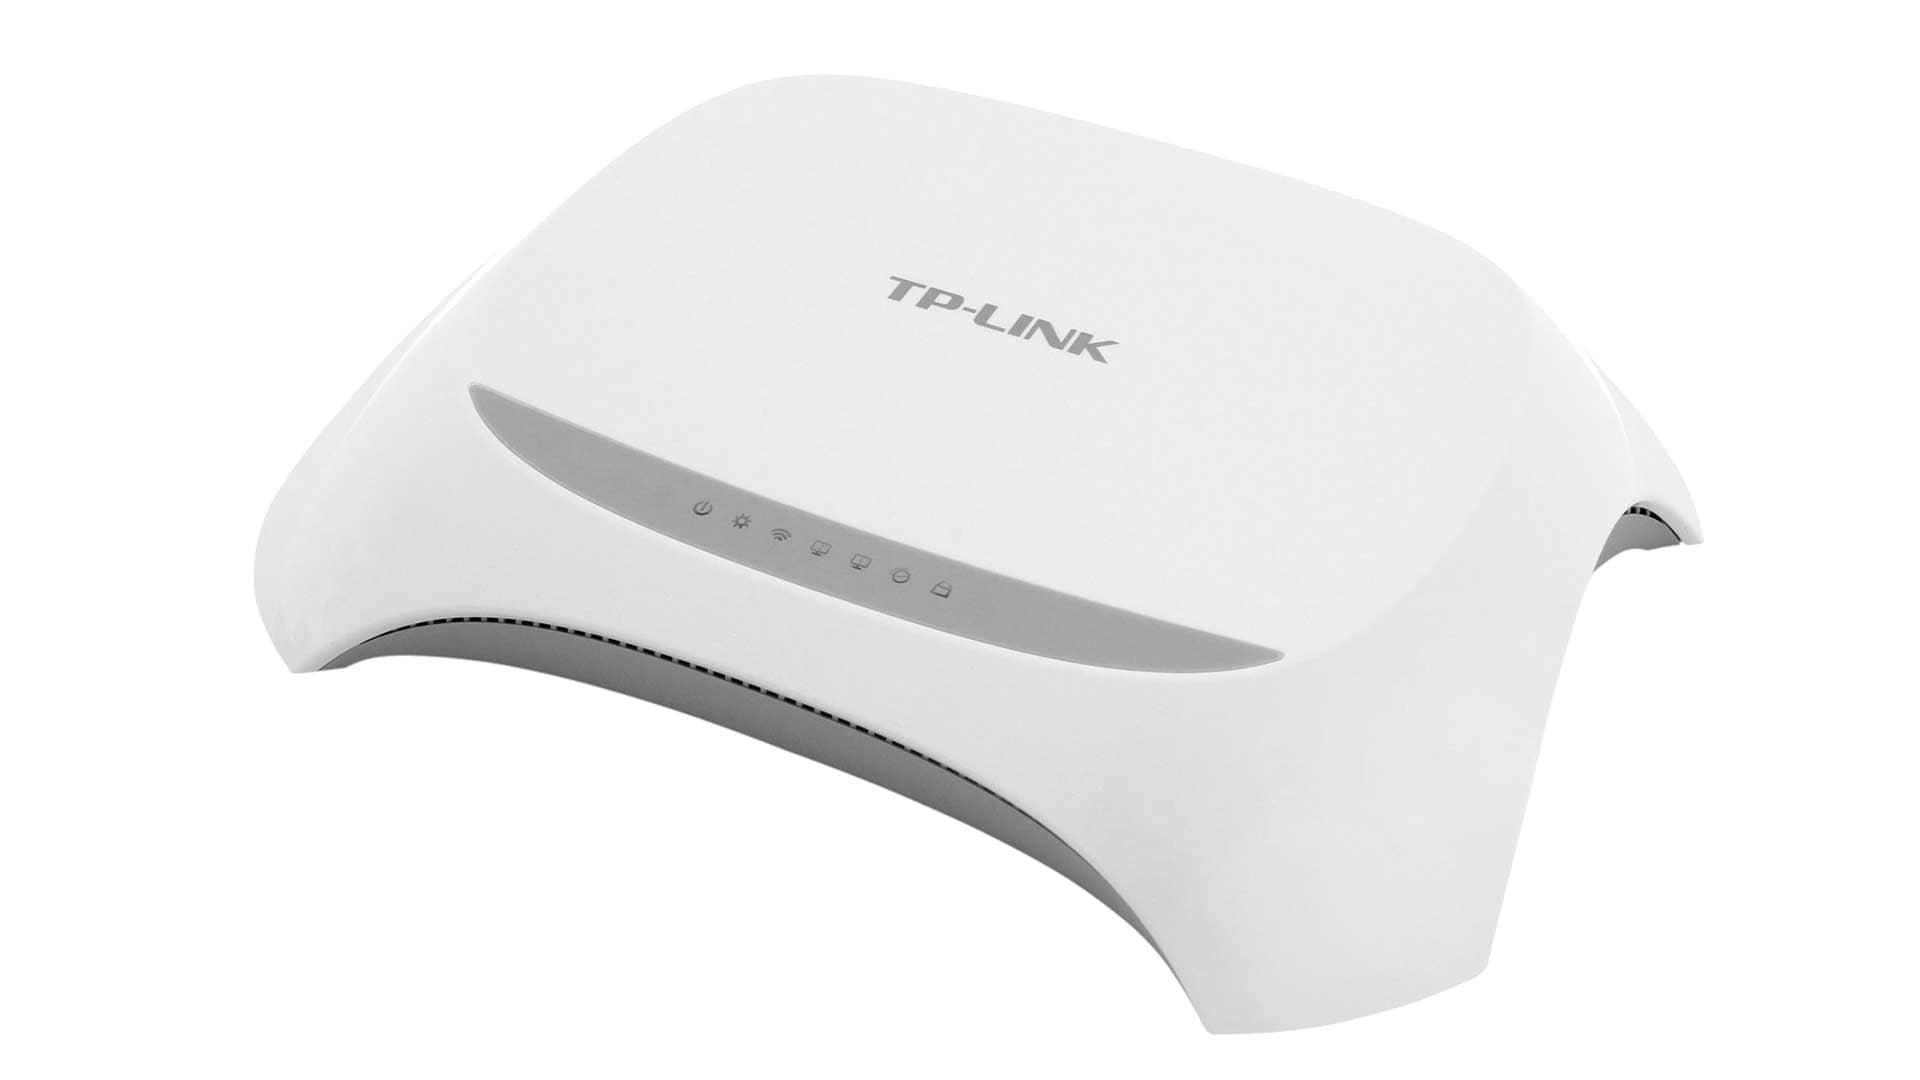 Беспроводной маршрутизатор TP-Link TL-WR720N: настройка и характеристики